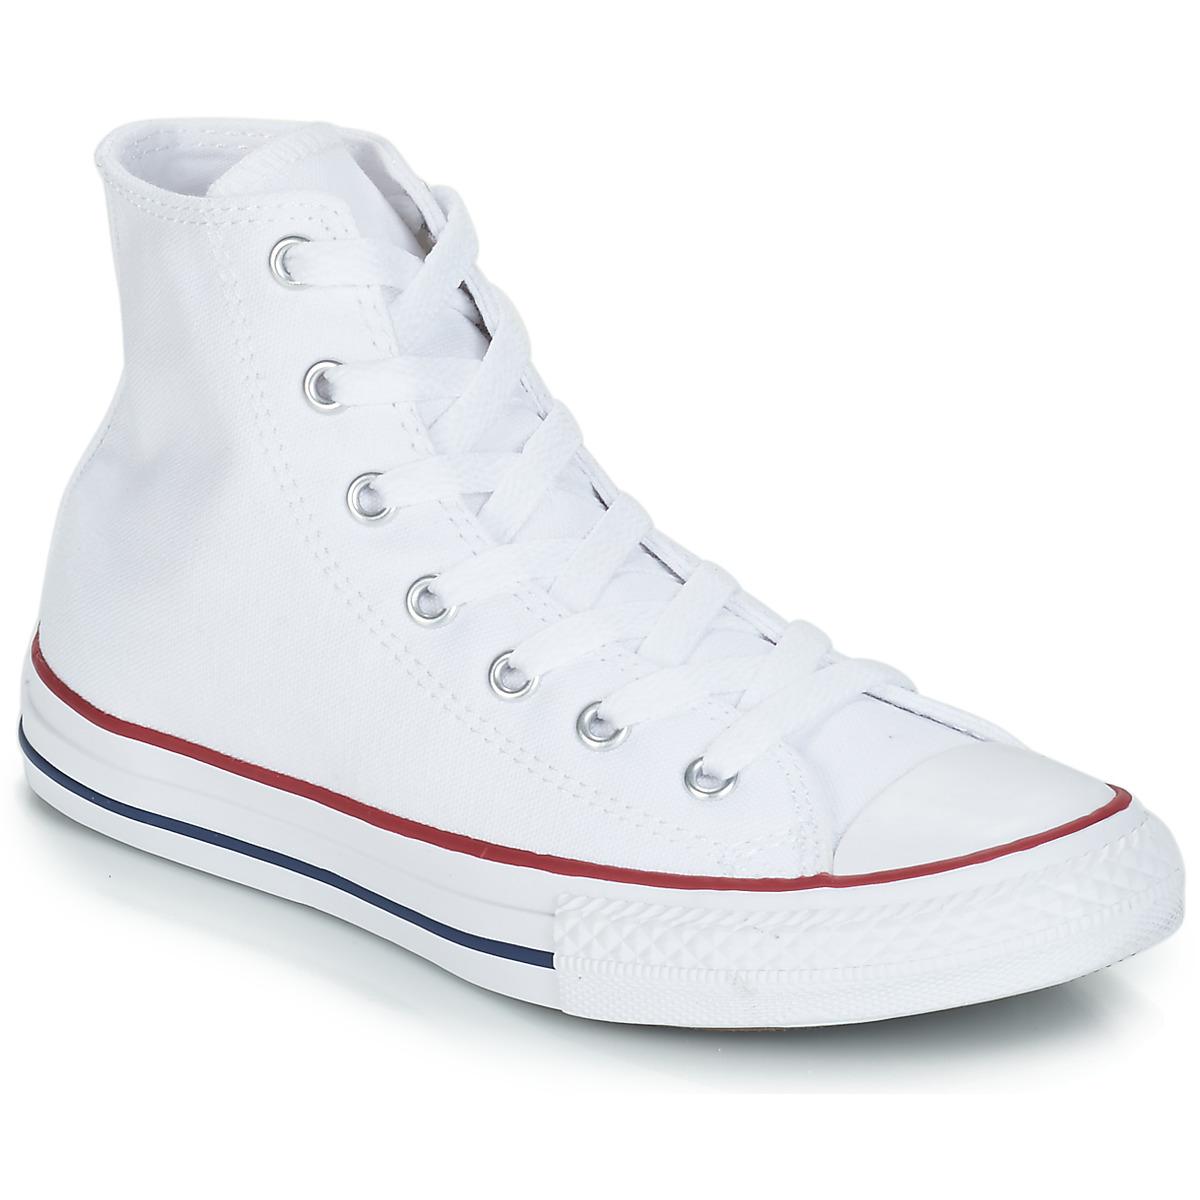 Converse CHUCK TAYLOR ALL STAR CORE HI Weiss